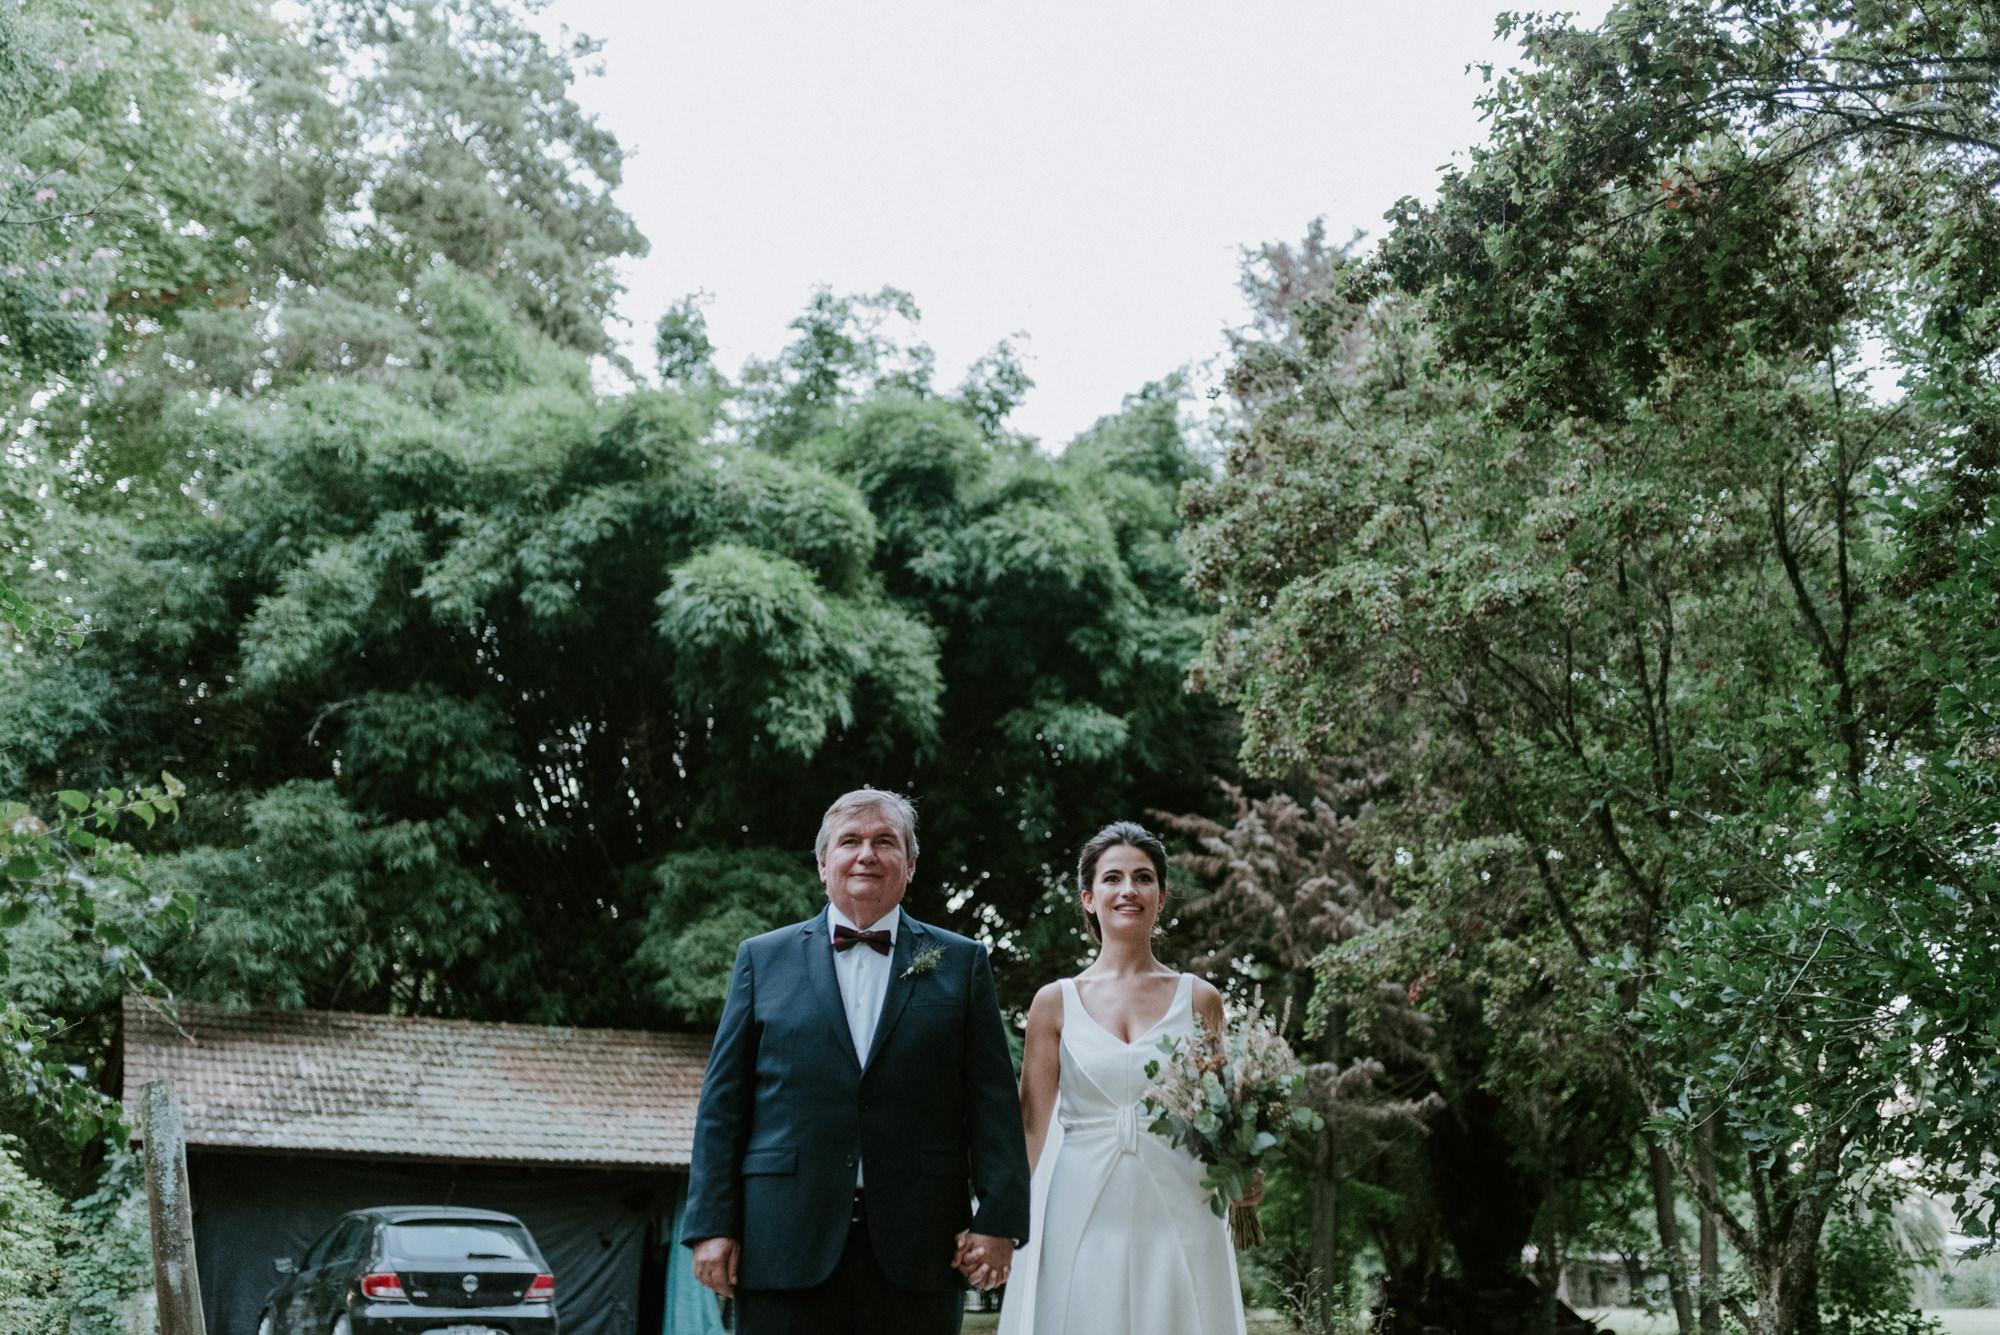 photography, mauricio,garay,wedding, fotografo ,photographer-353.jpg